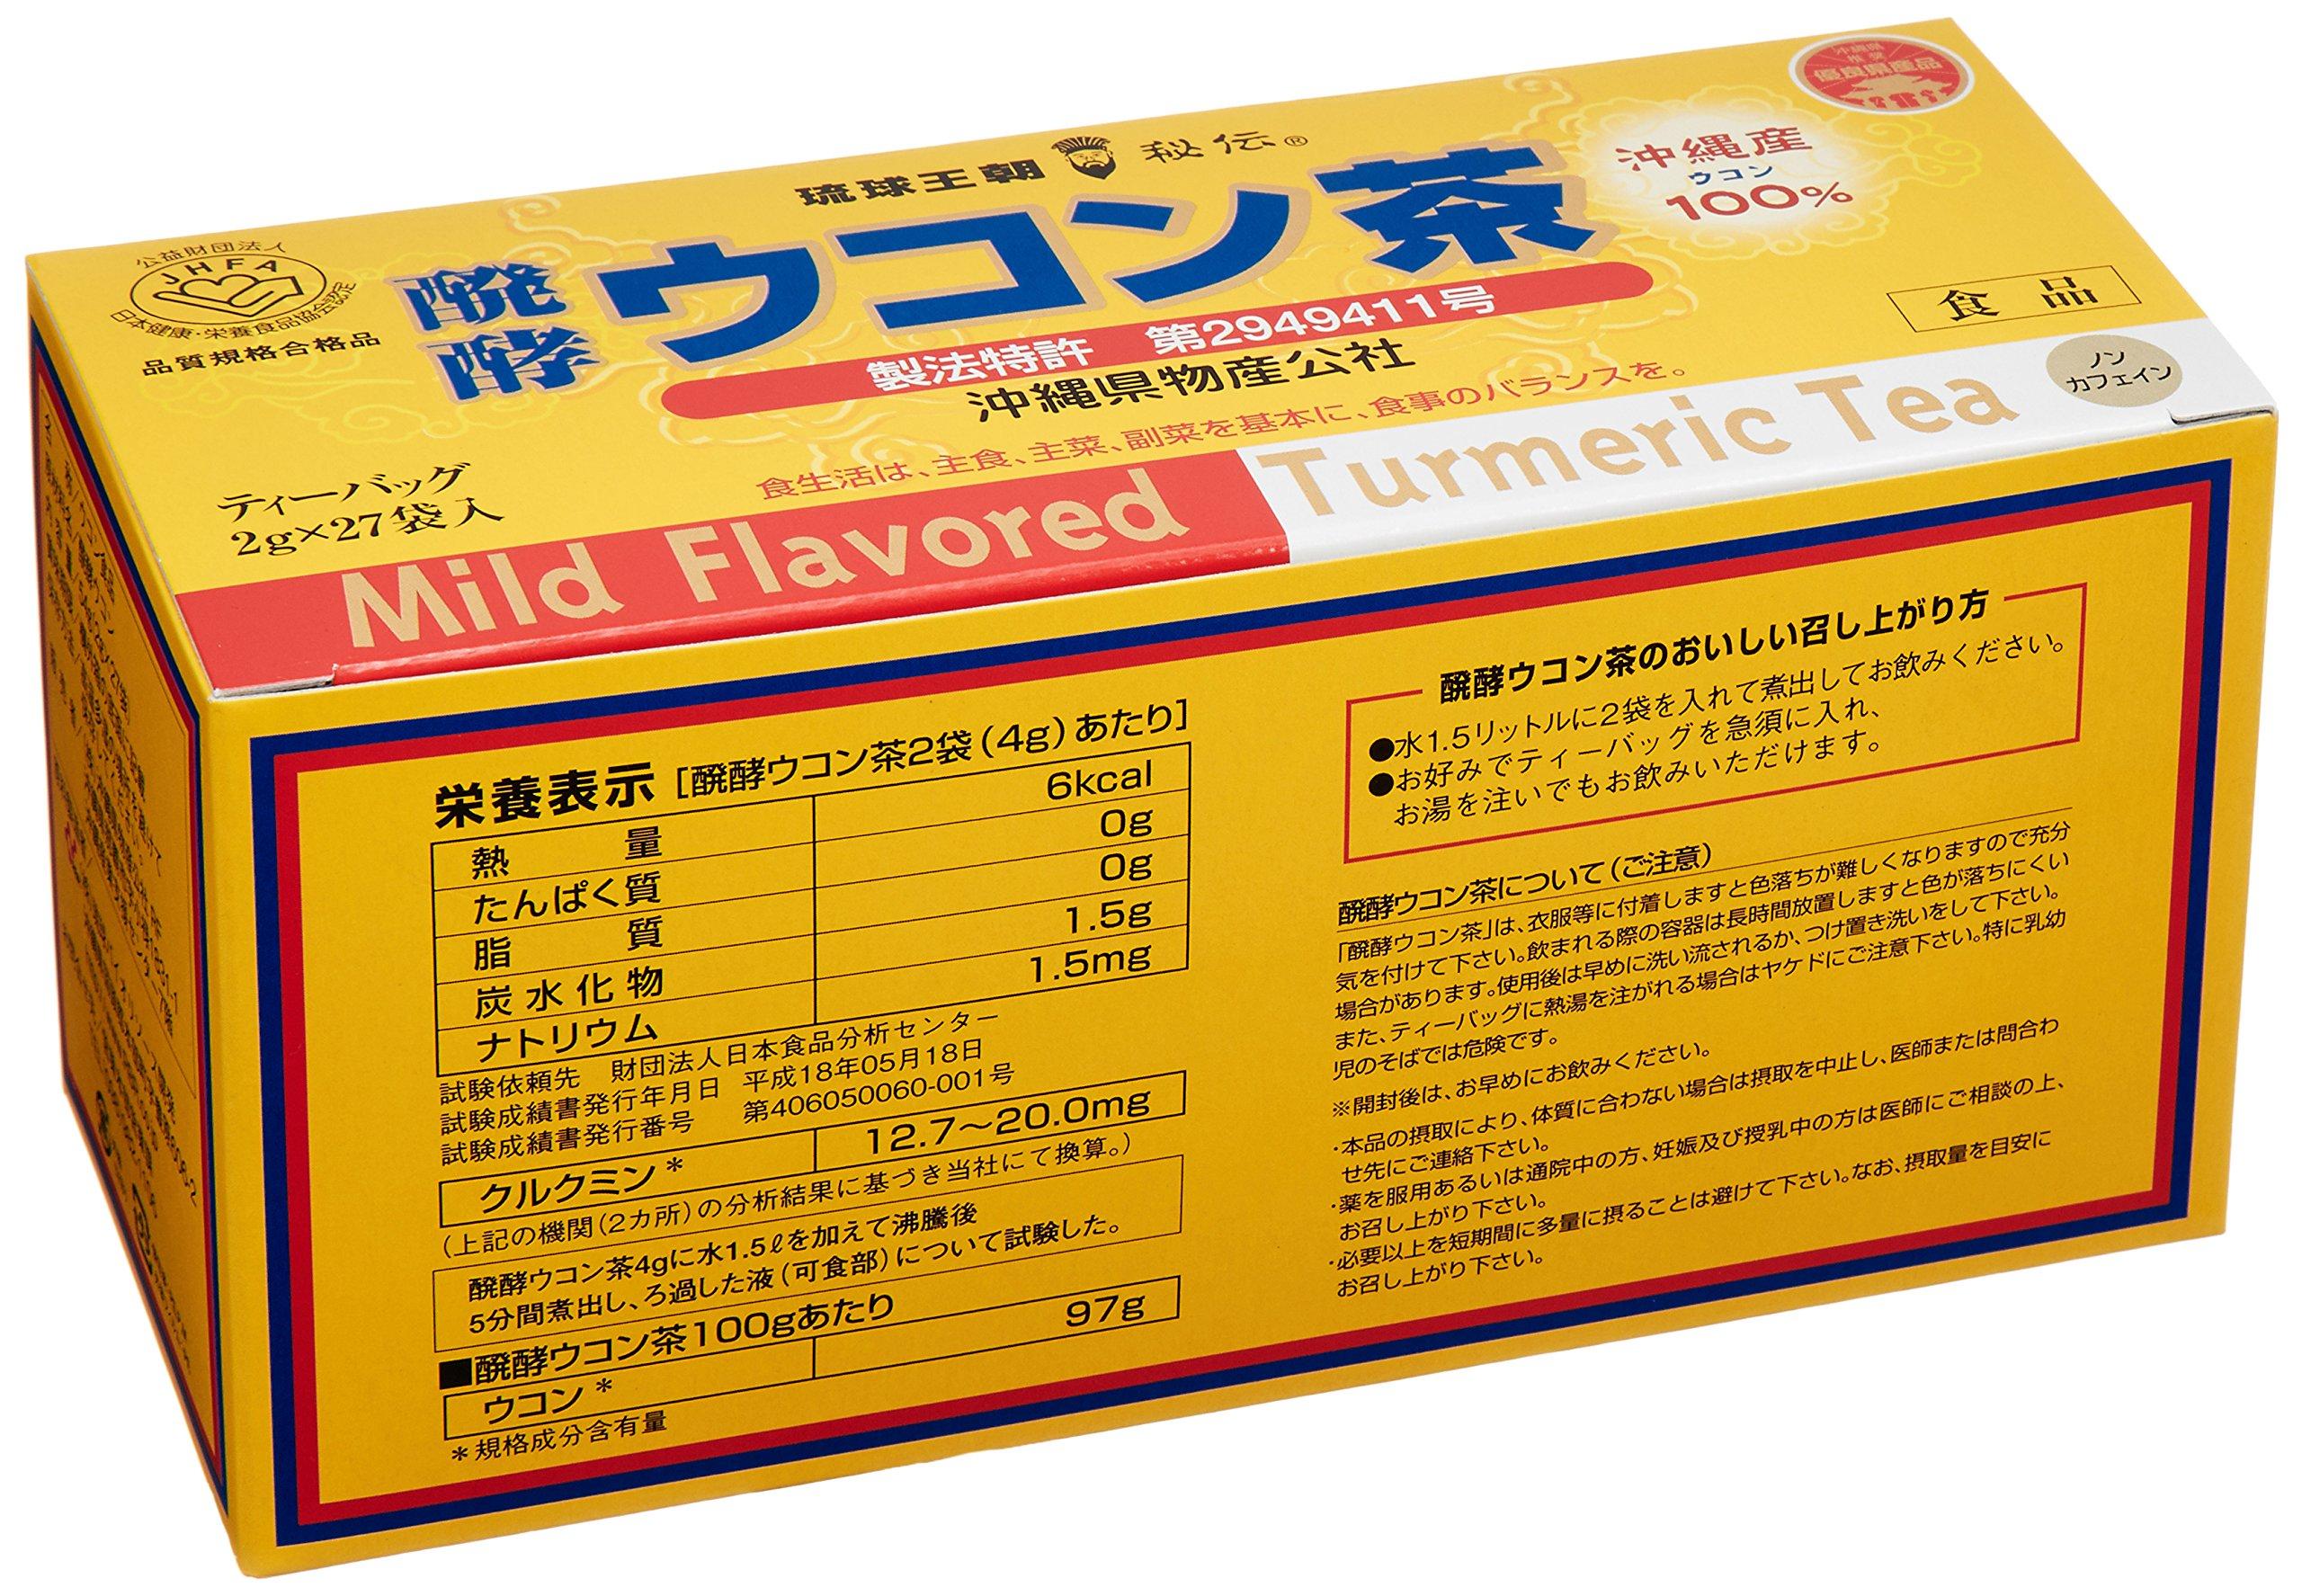 Fermented Turmeric Tea From Okinawa